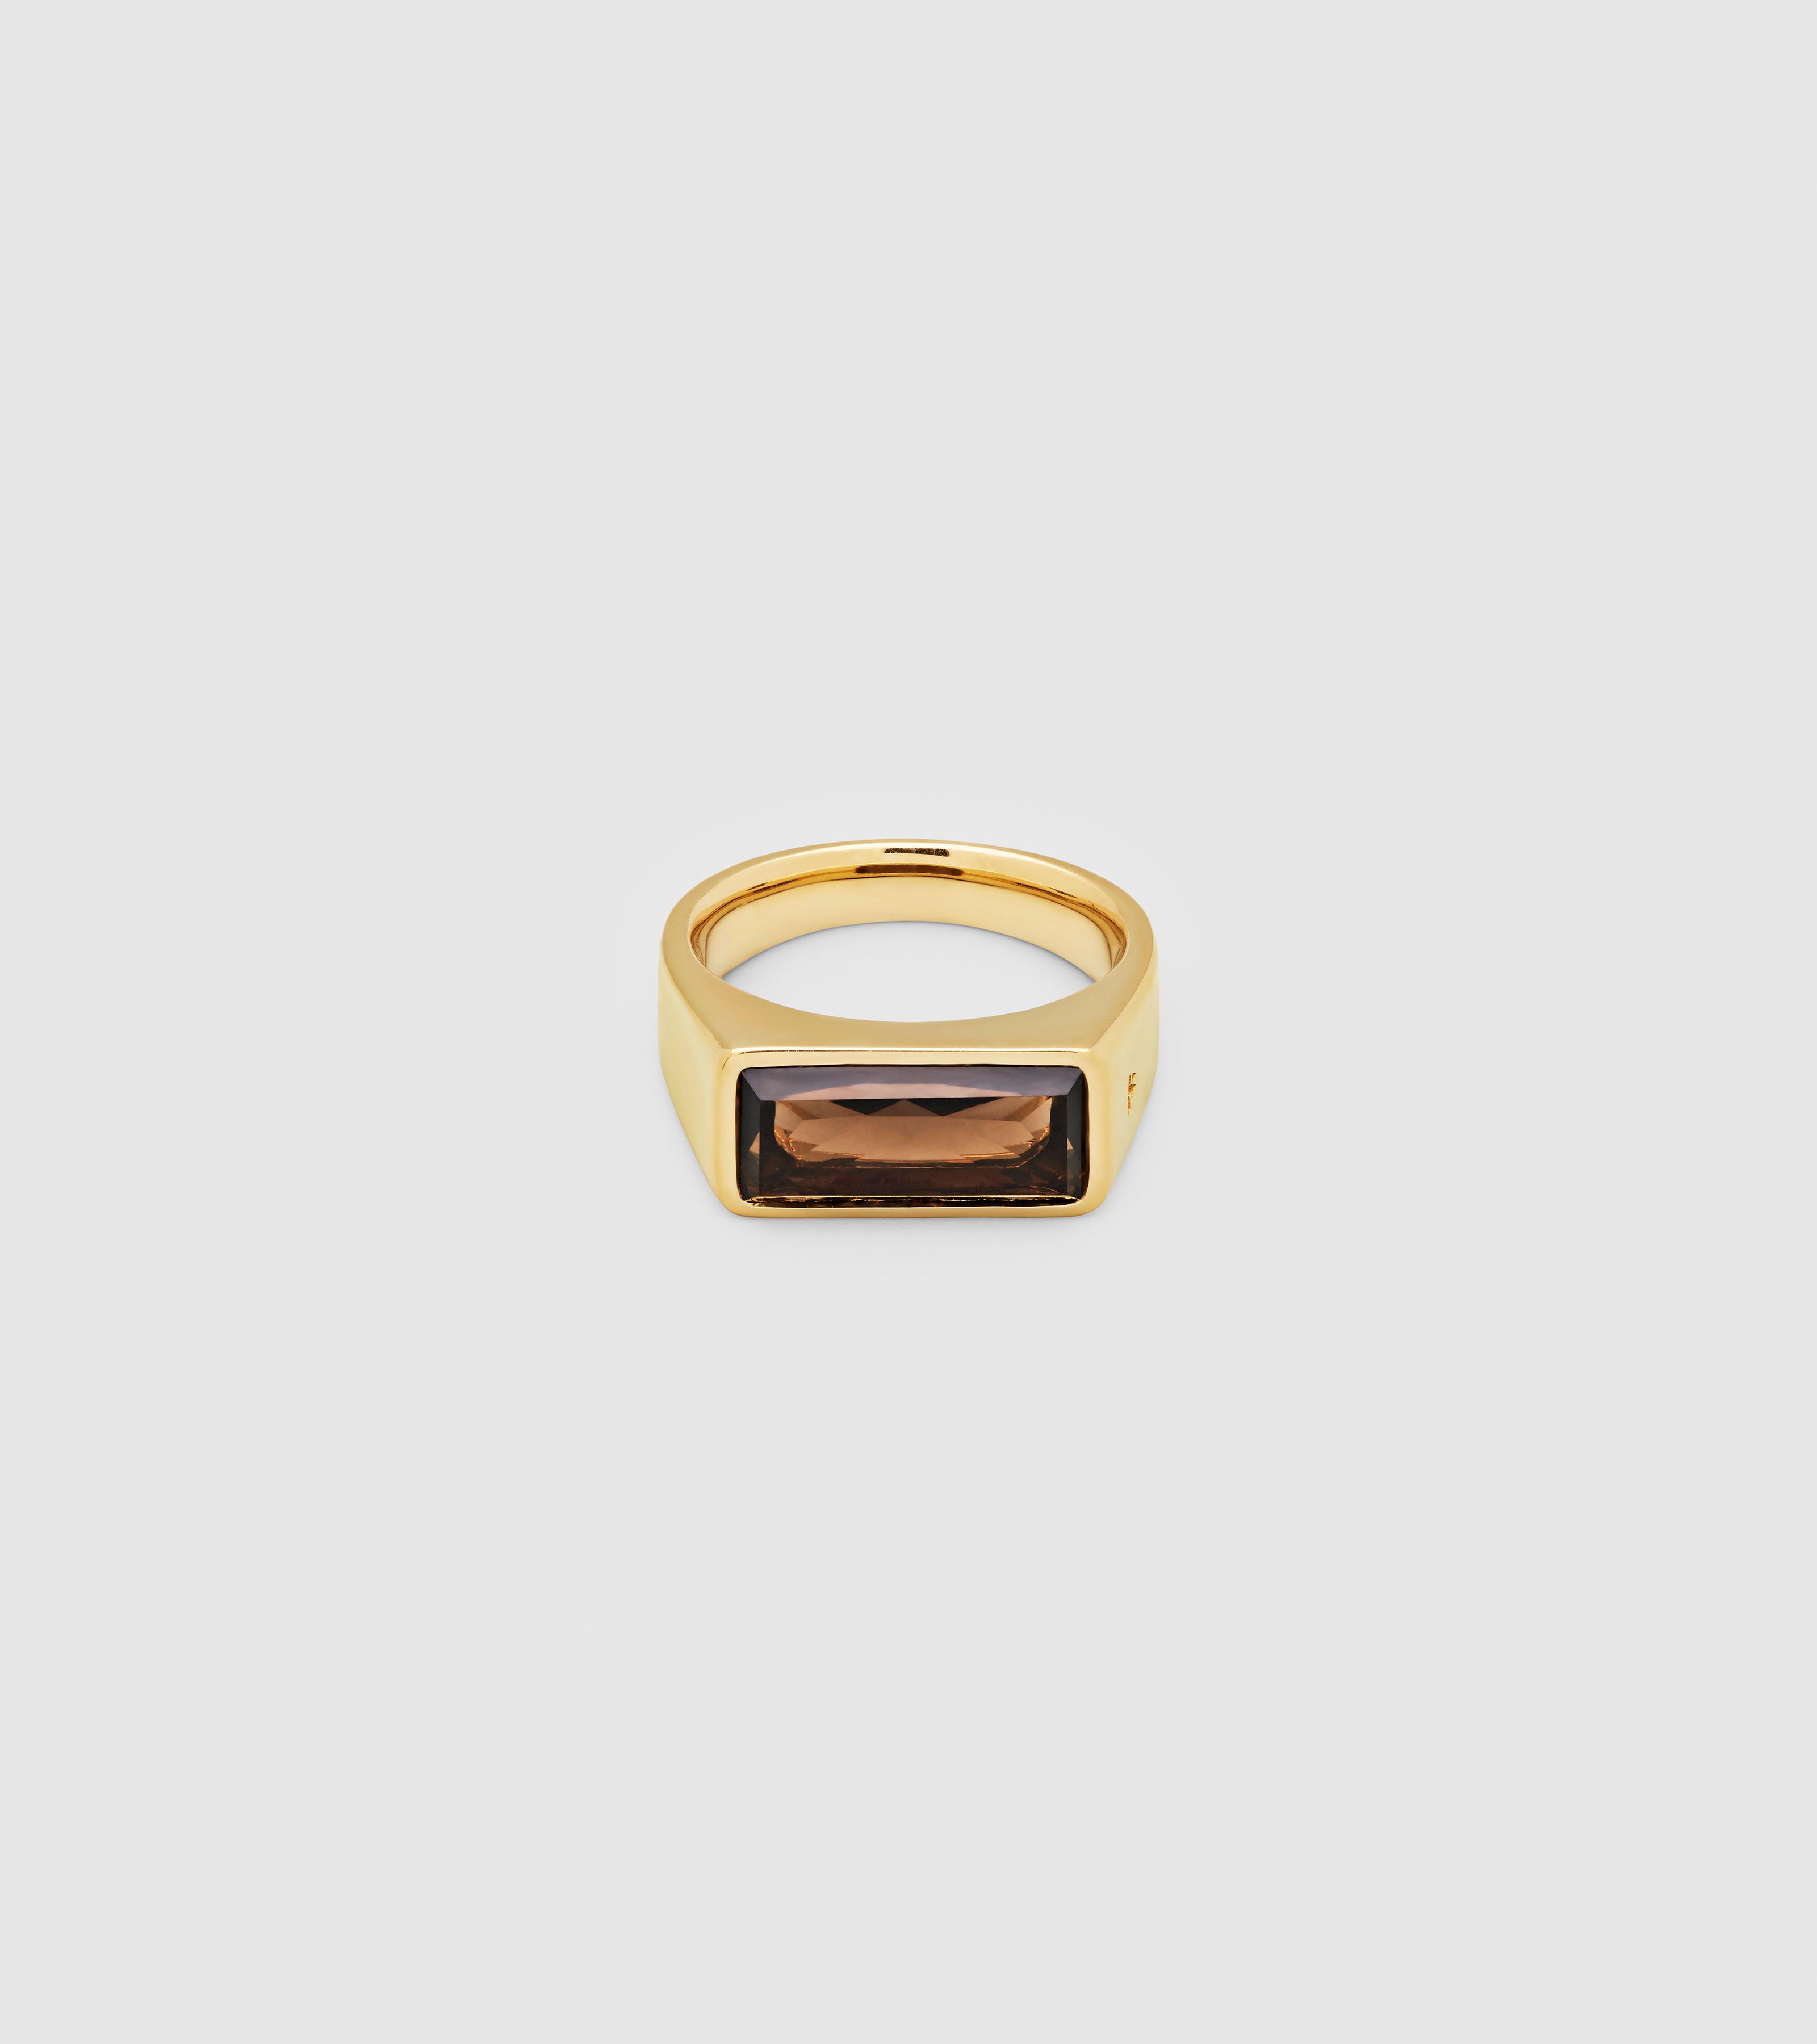 Peaky Ring Smoky Quartz Gold